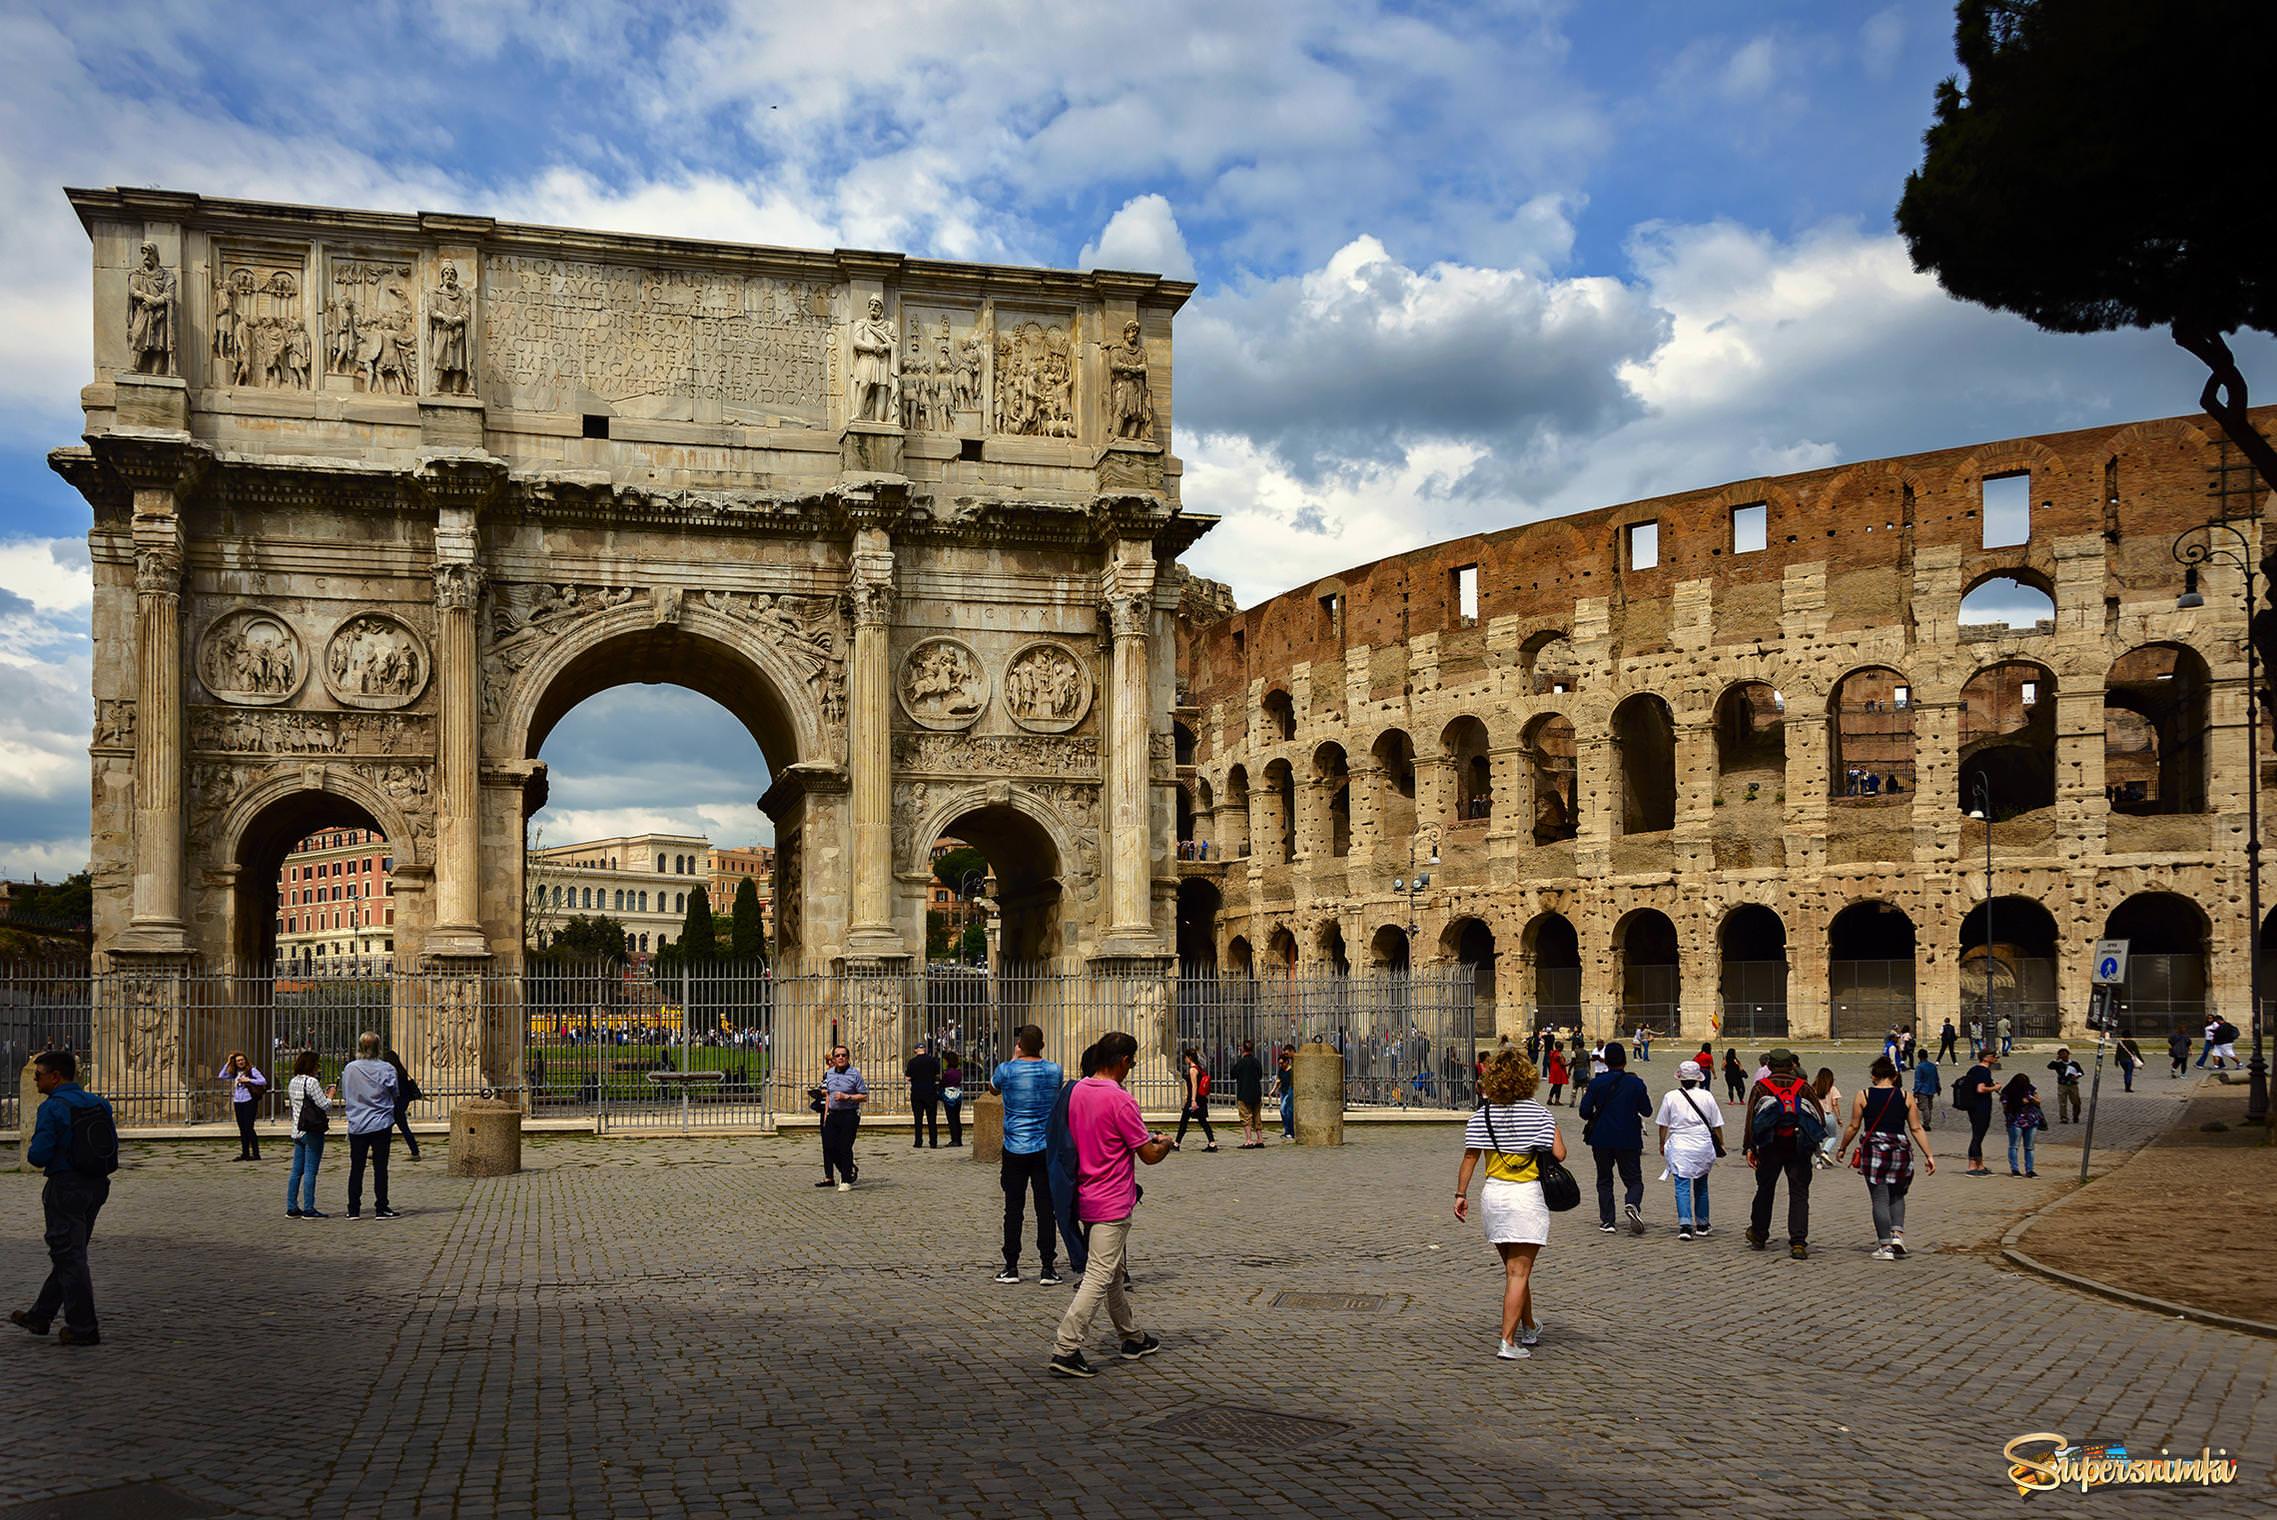 древний рим архитектура кратко фото считаете